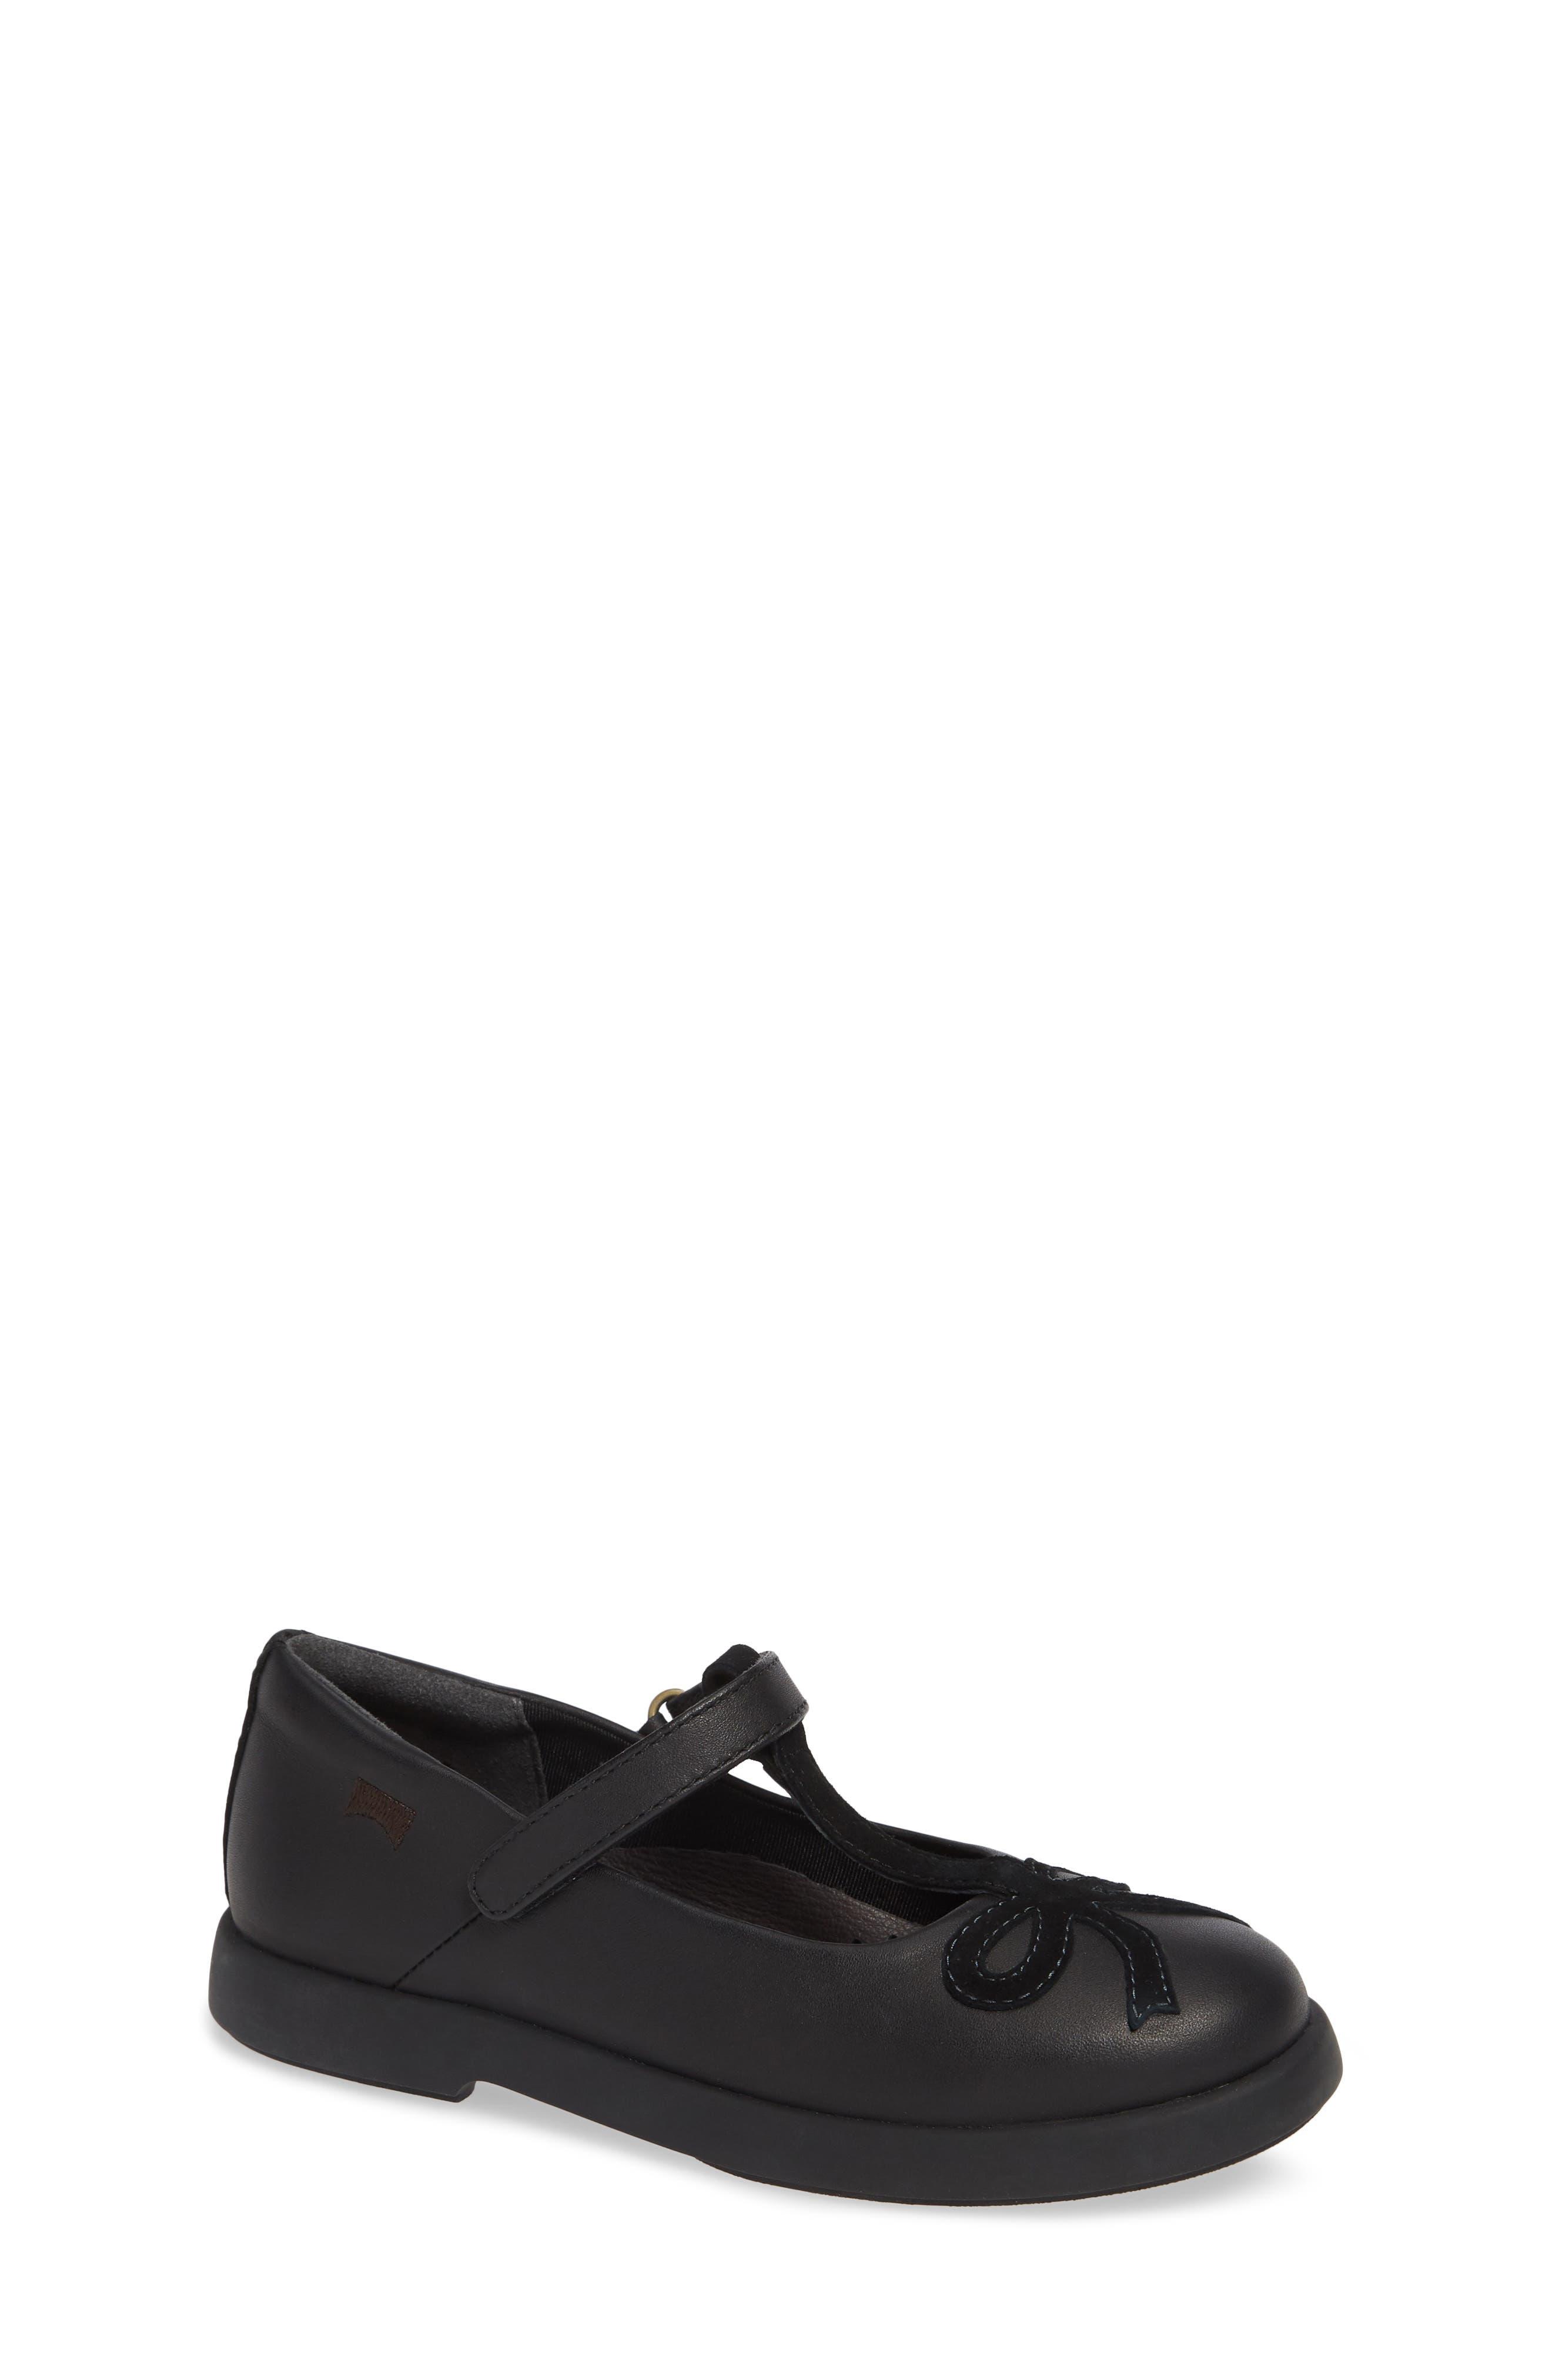 Twins Mary Jane Shoe,                         Main,                         color, BLACK